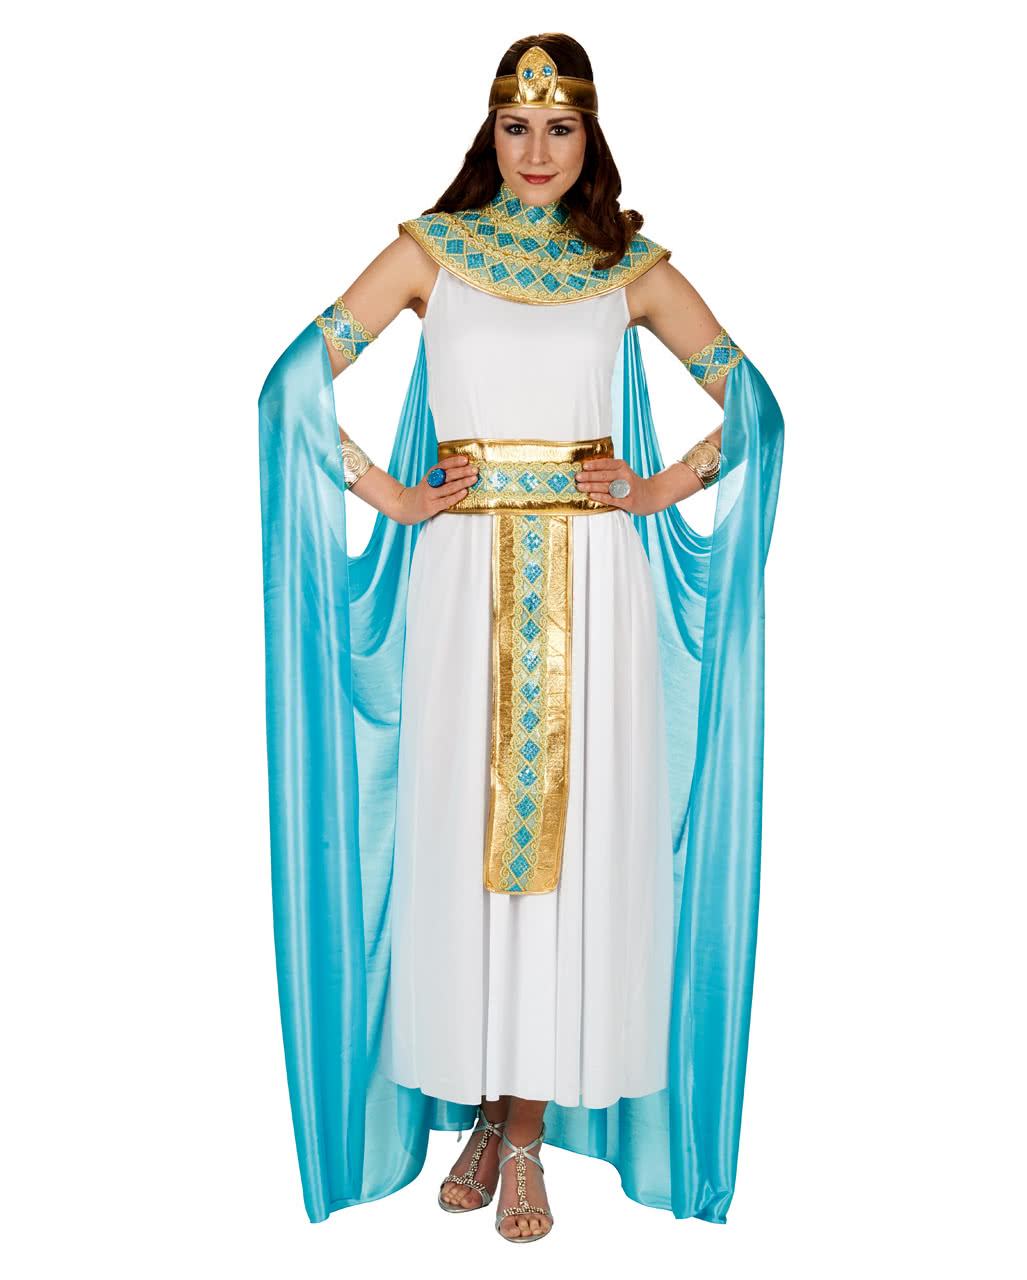 cleopatra damenkost m mit cape als karnevalskost m. Black Bedroom Furniture Sets. Home Design Ideas